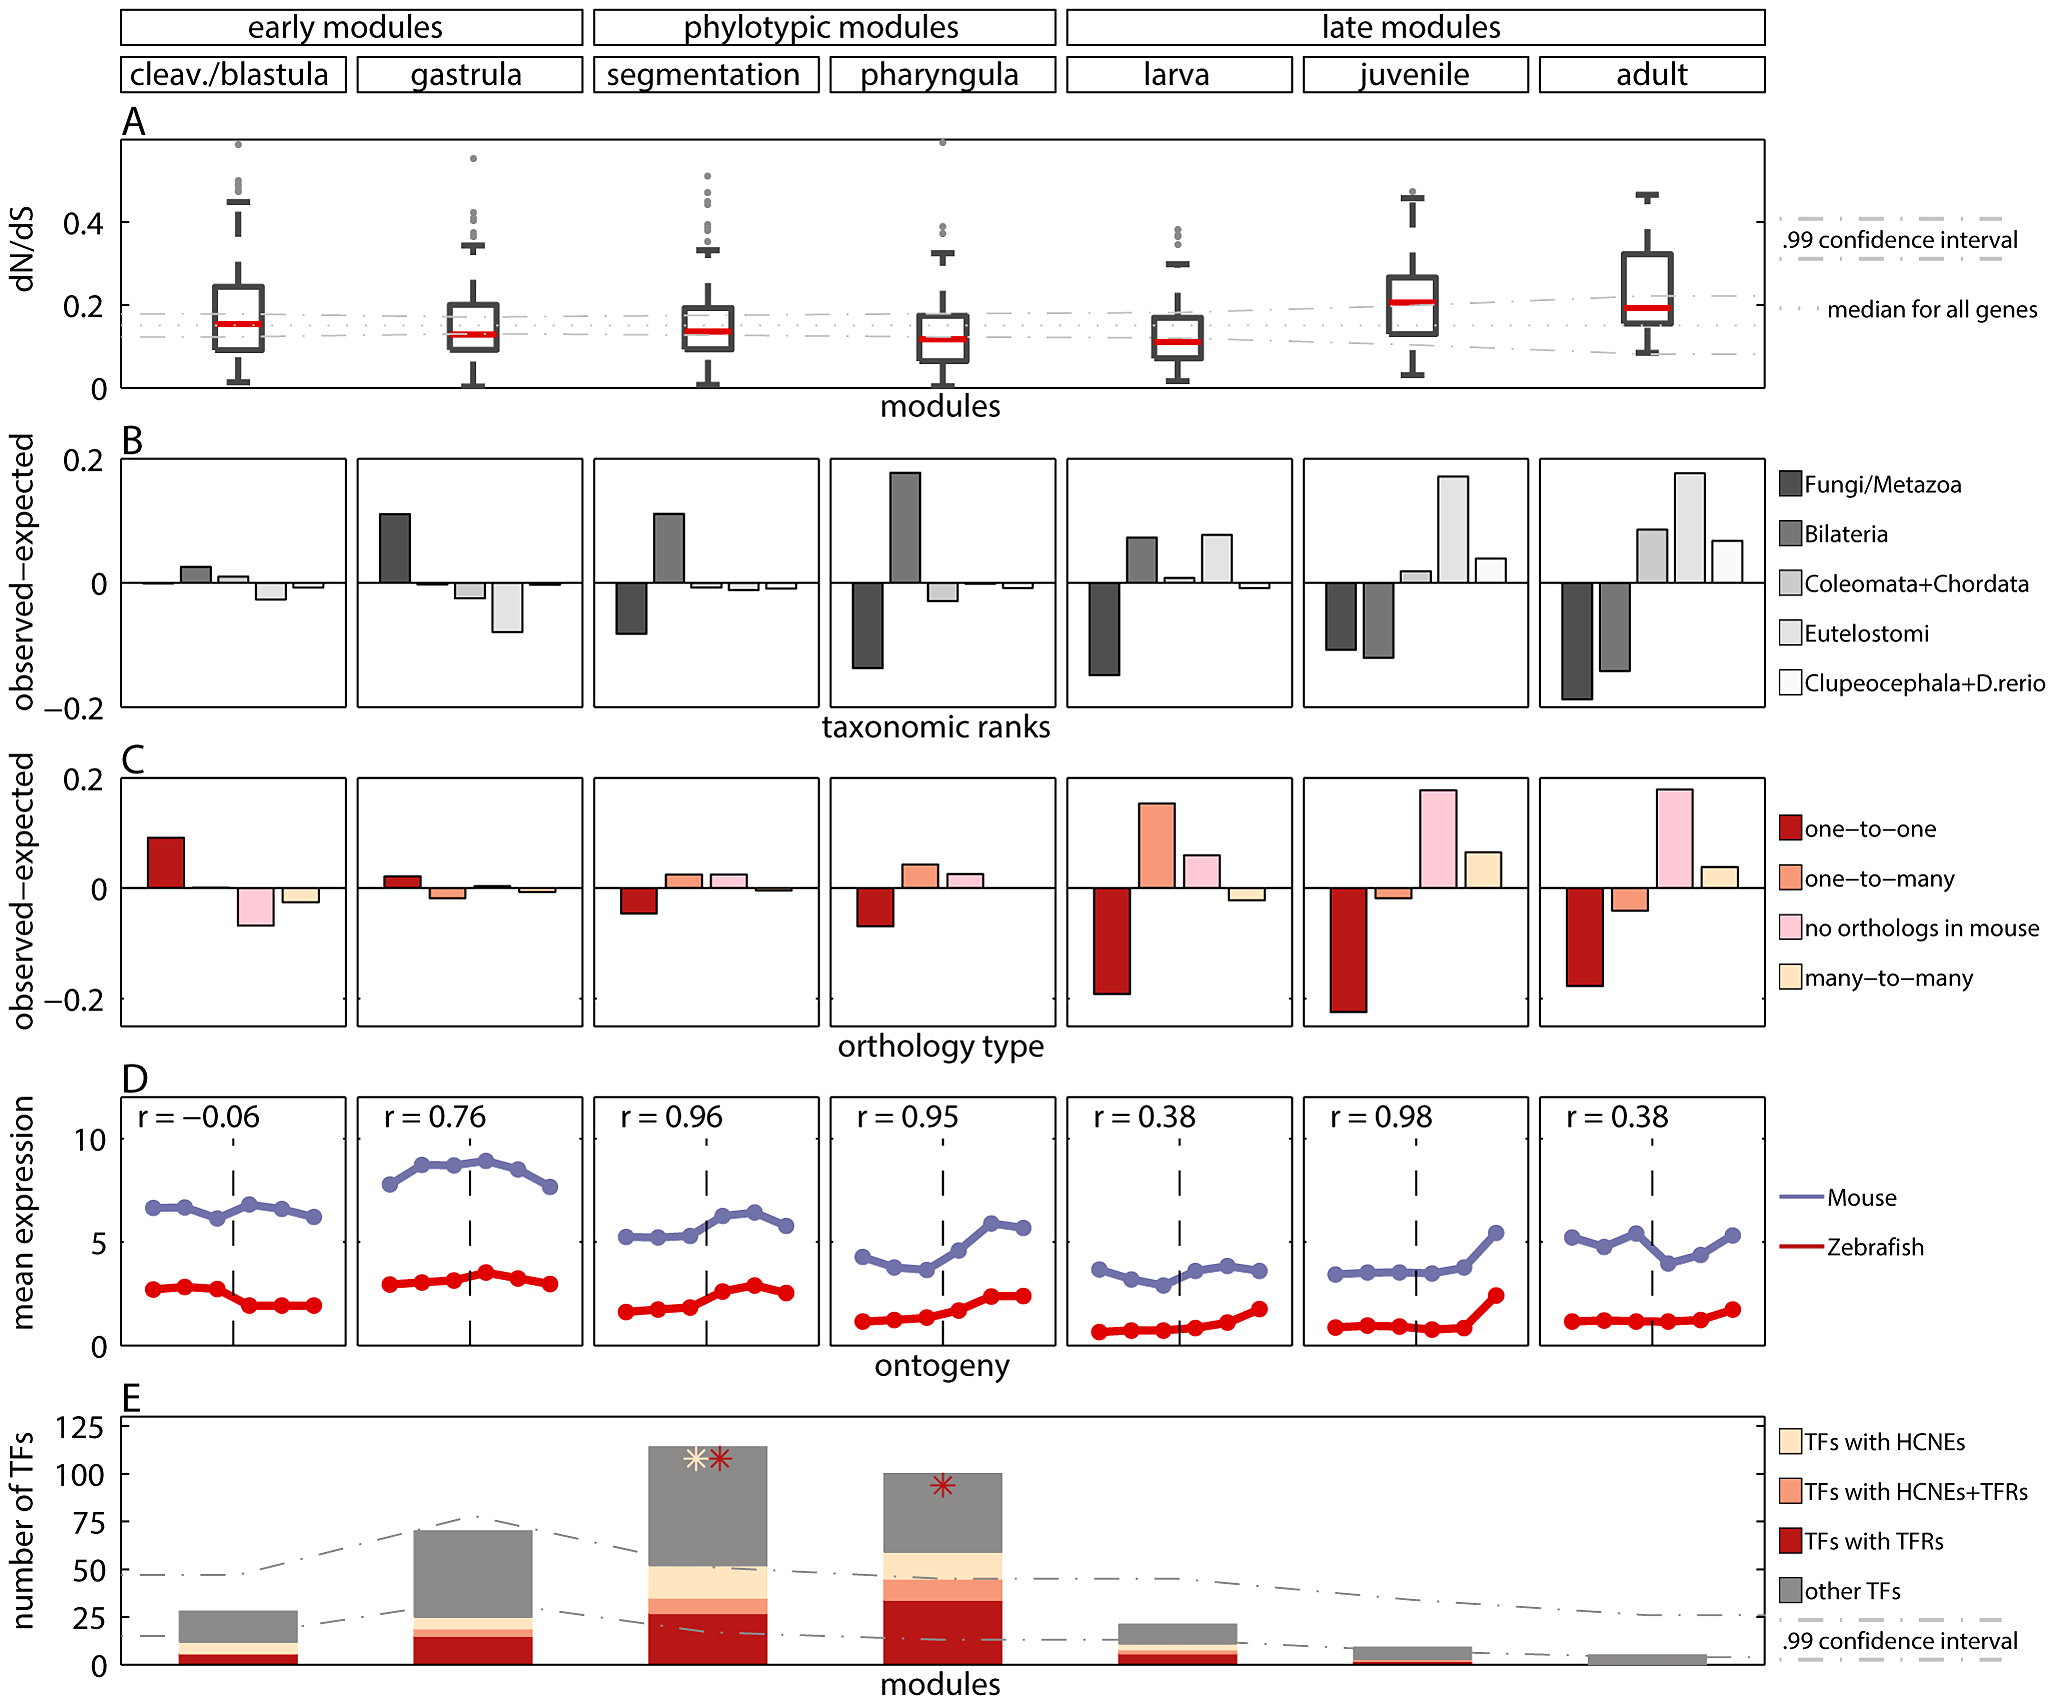 Measures of developmental constraints for various gene properties.